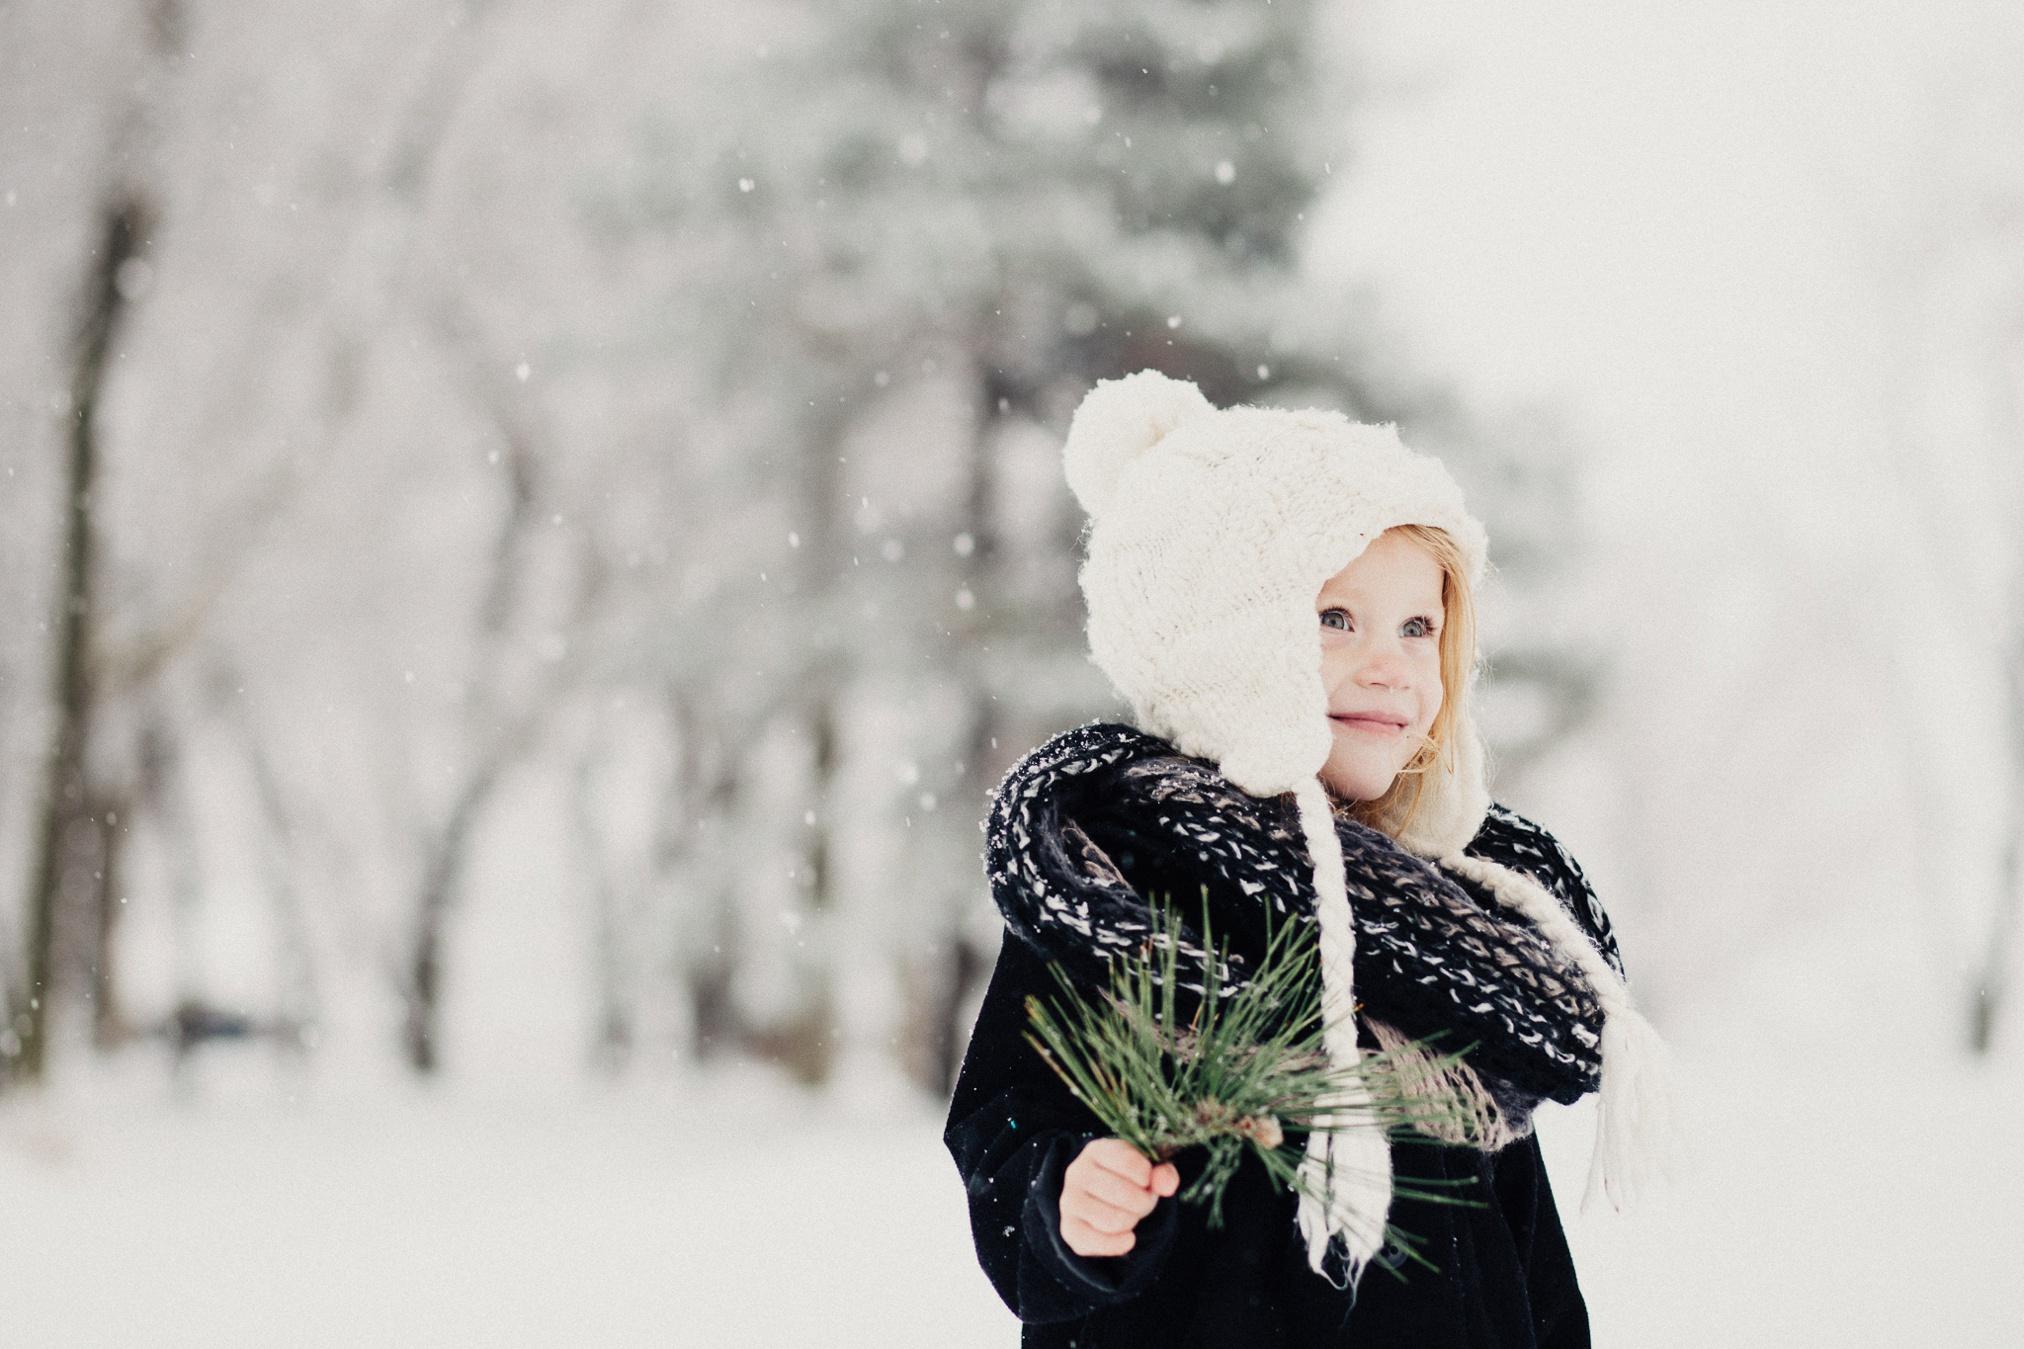 Zoe_Cohen_Snow_2015_web-40.jpg